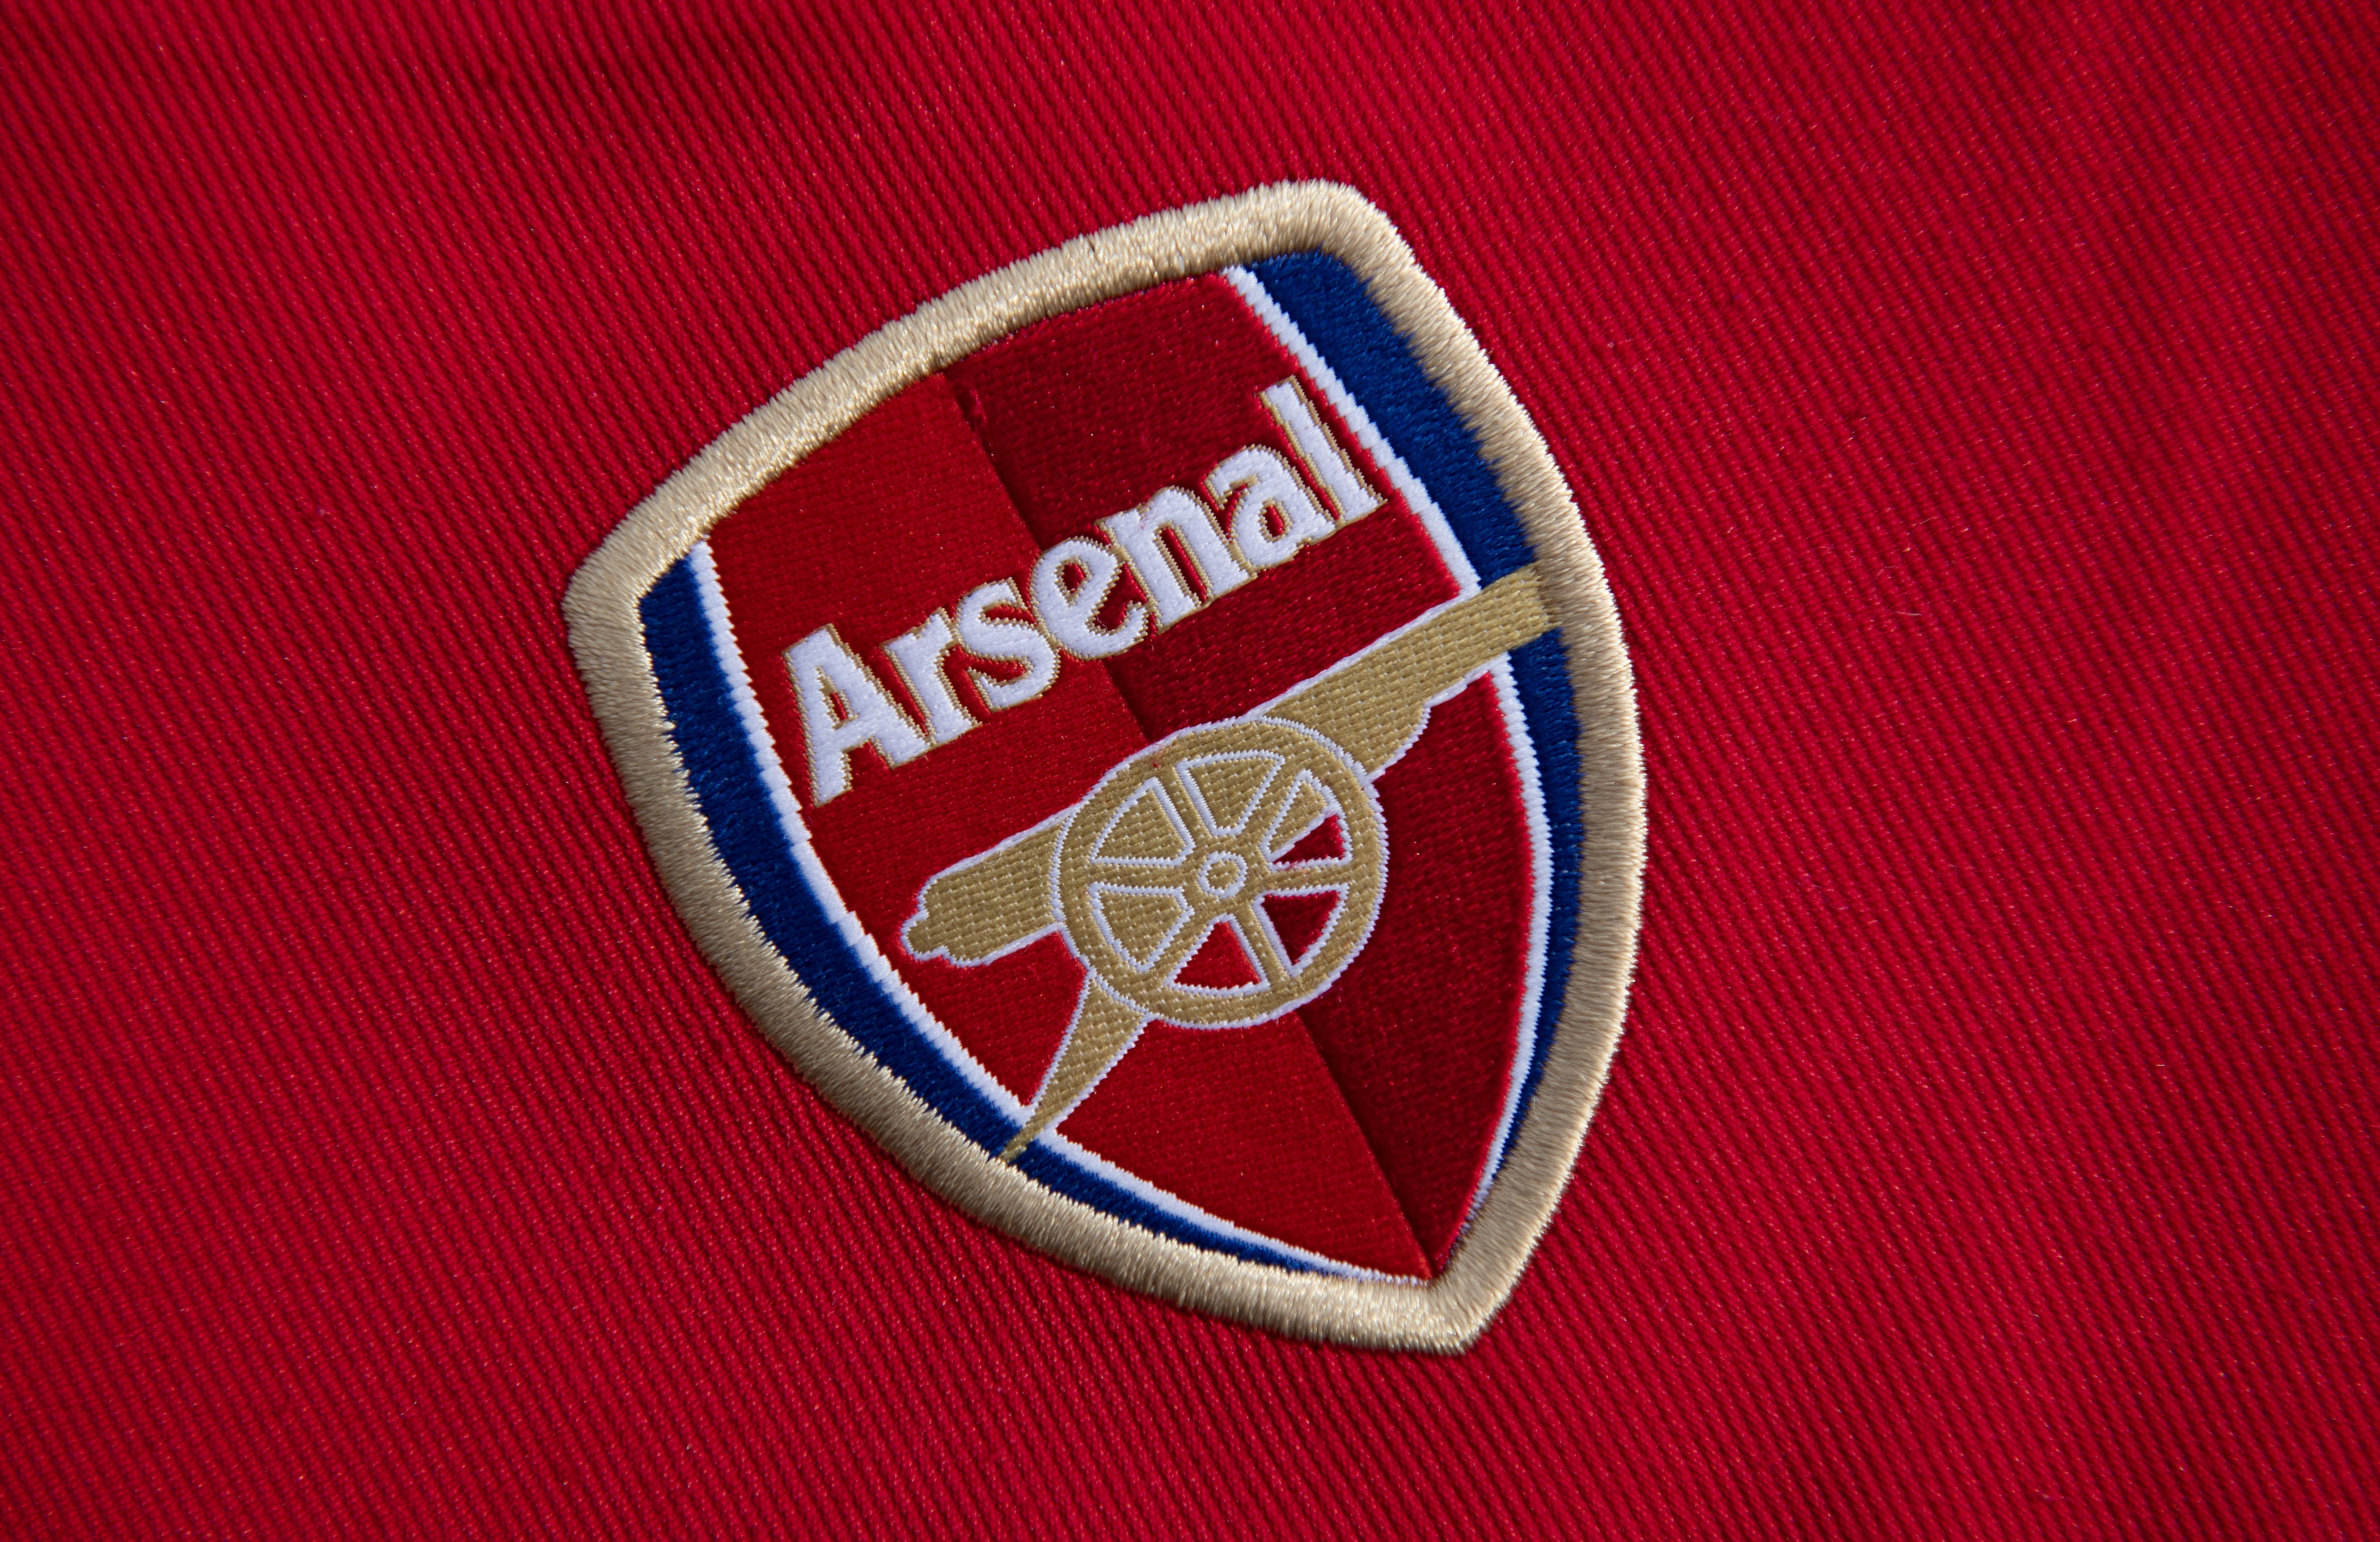 Arsenal Club Badge